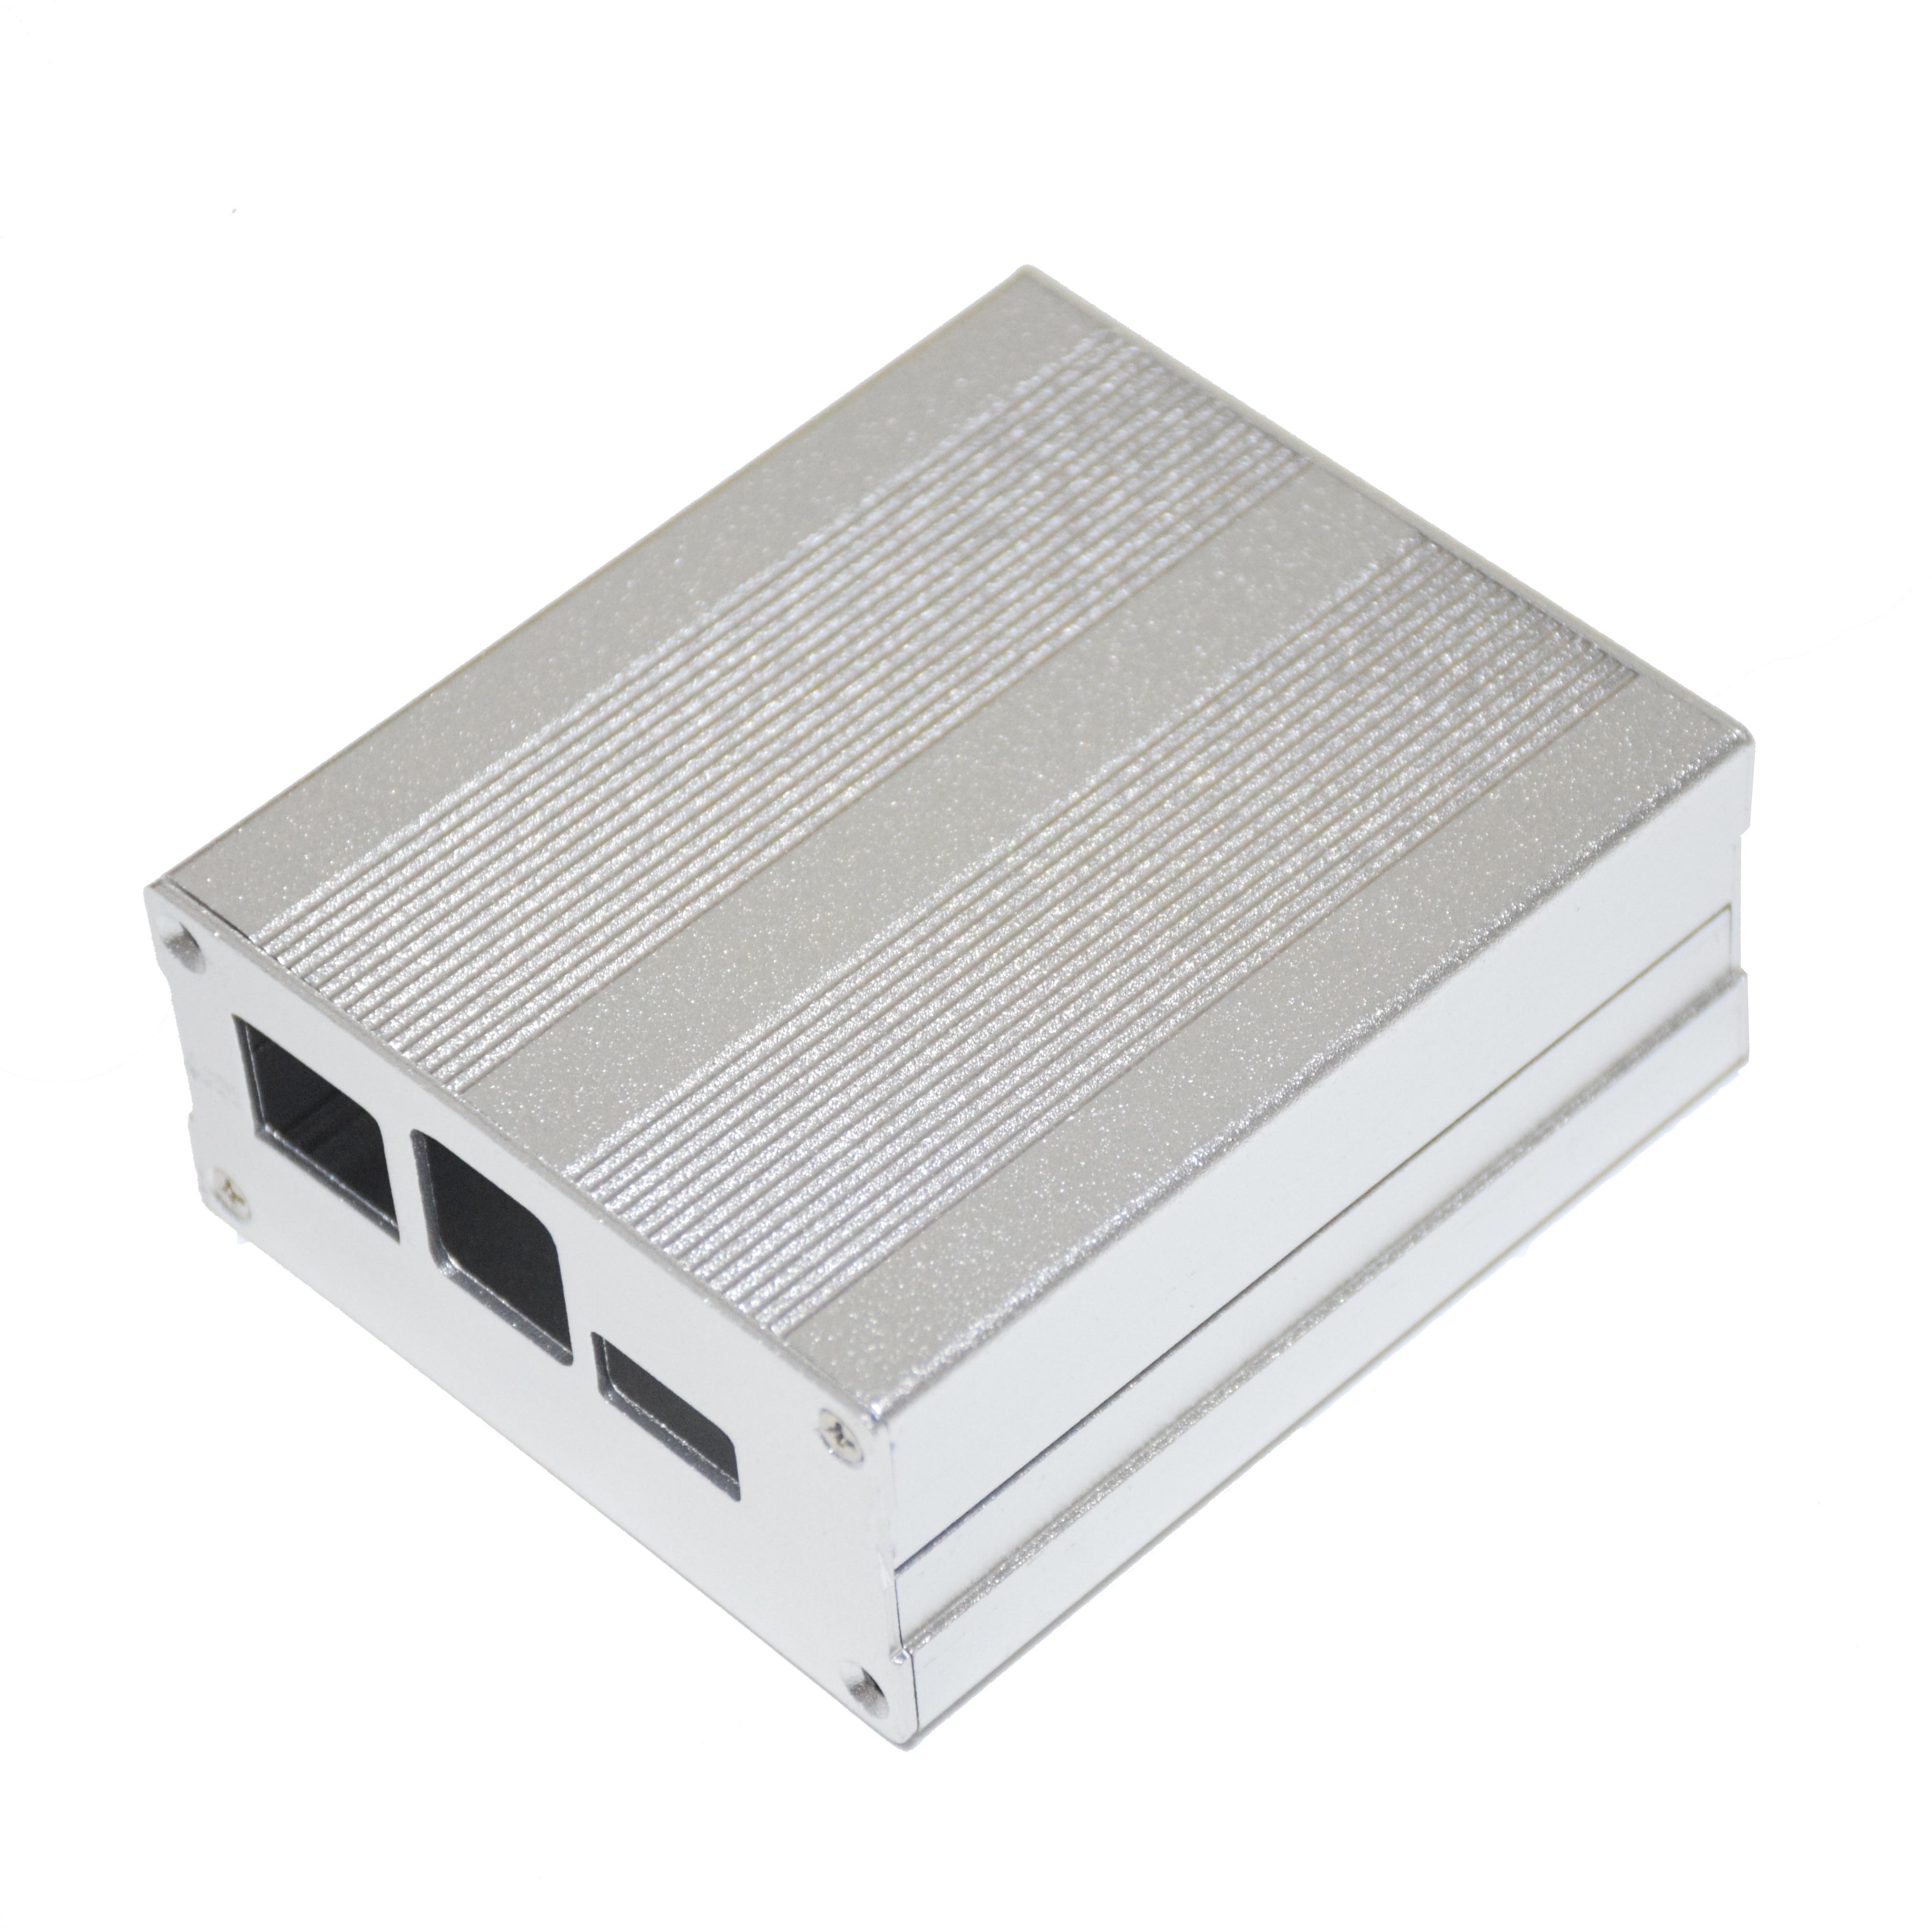 Aluminum Alloy Case For PINE64 ROCK64 demo Board Enclosure Case